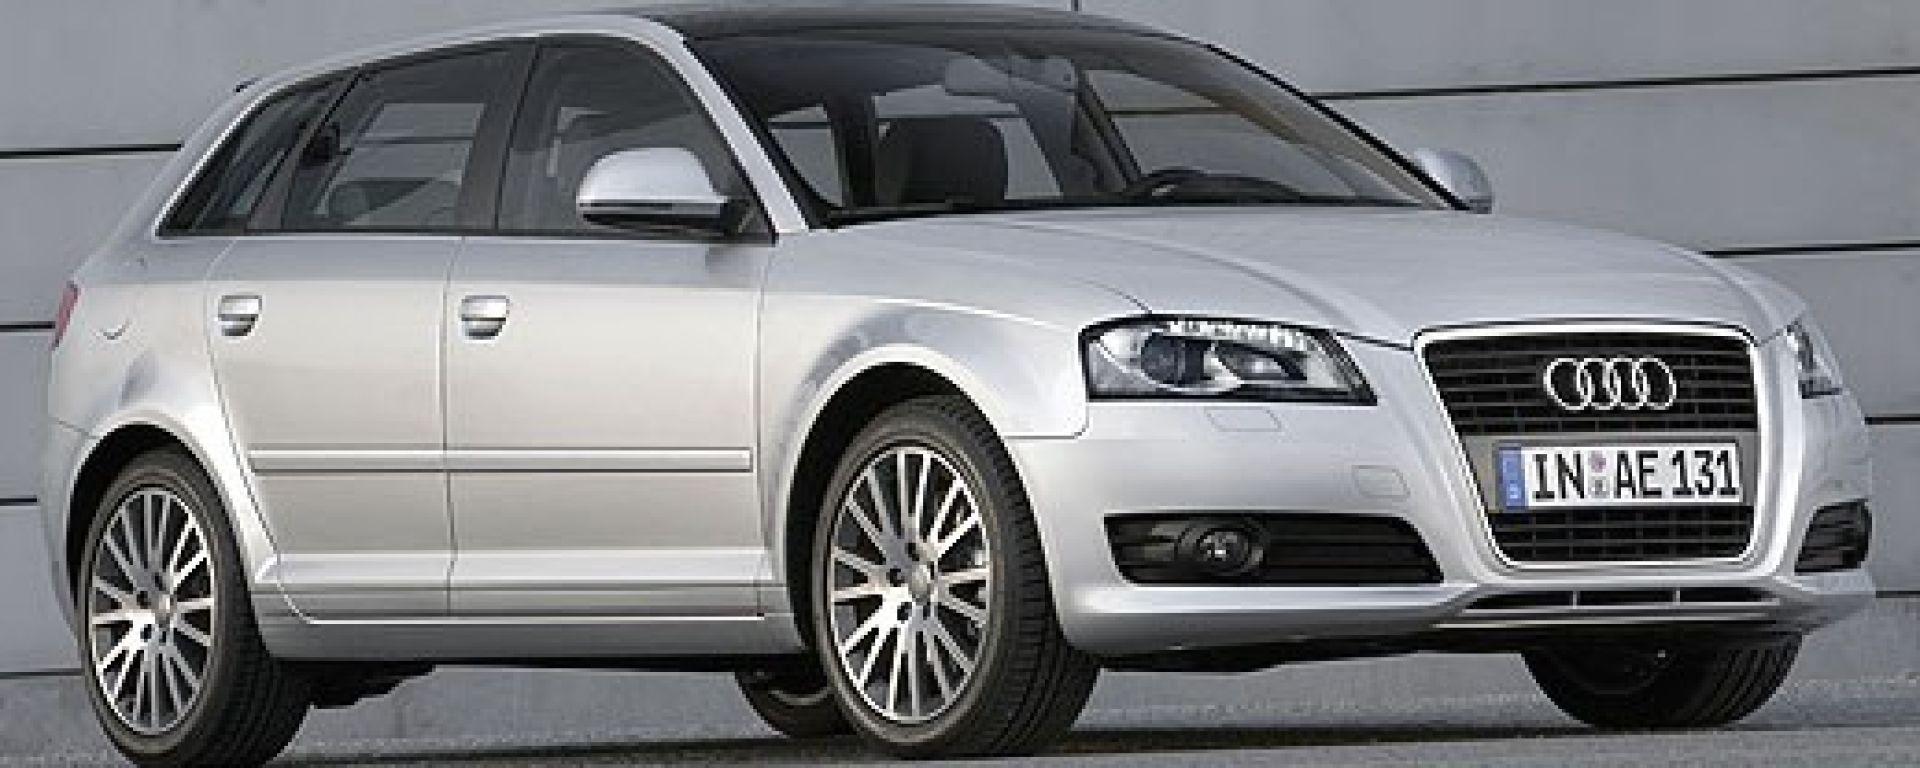 Audi S3 Sportback >> Prova: Audi A3, S3 e Sportback 2008 - MotorBox